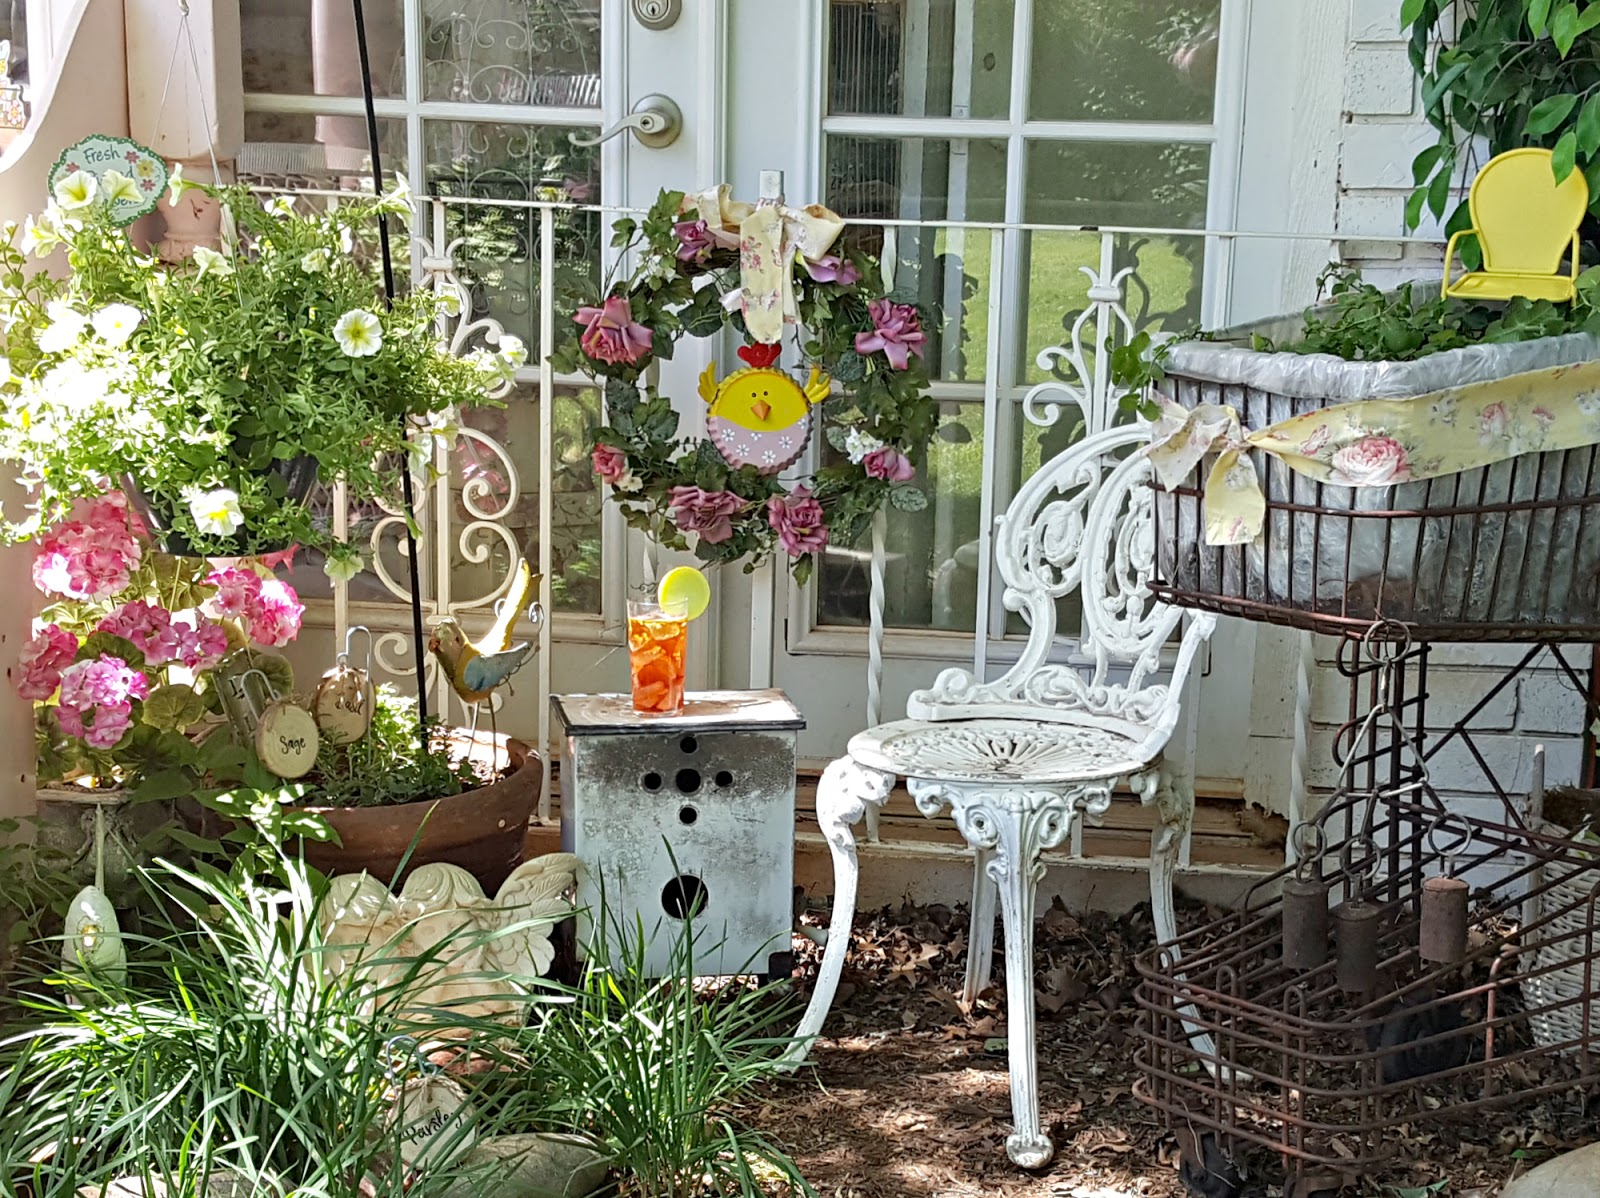 pictures of vintage herb gardens | Penny's Vintage Home: Herb Garden